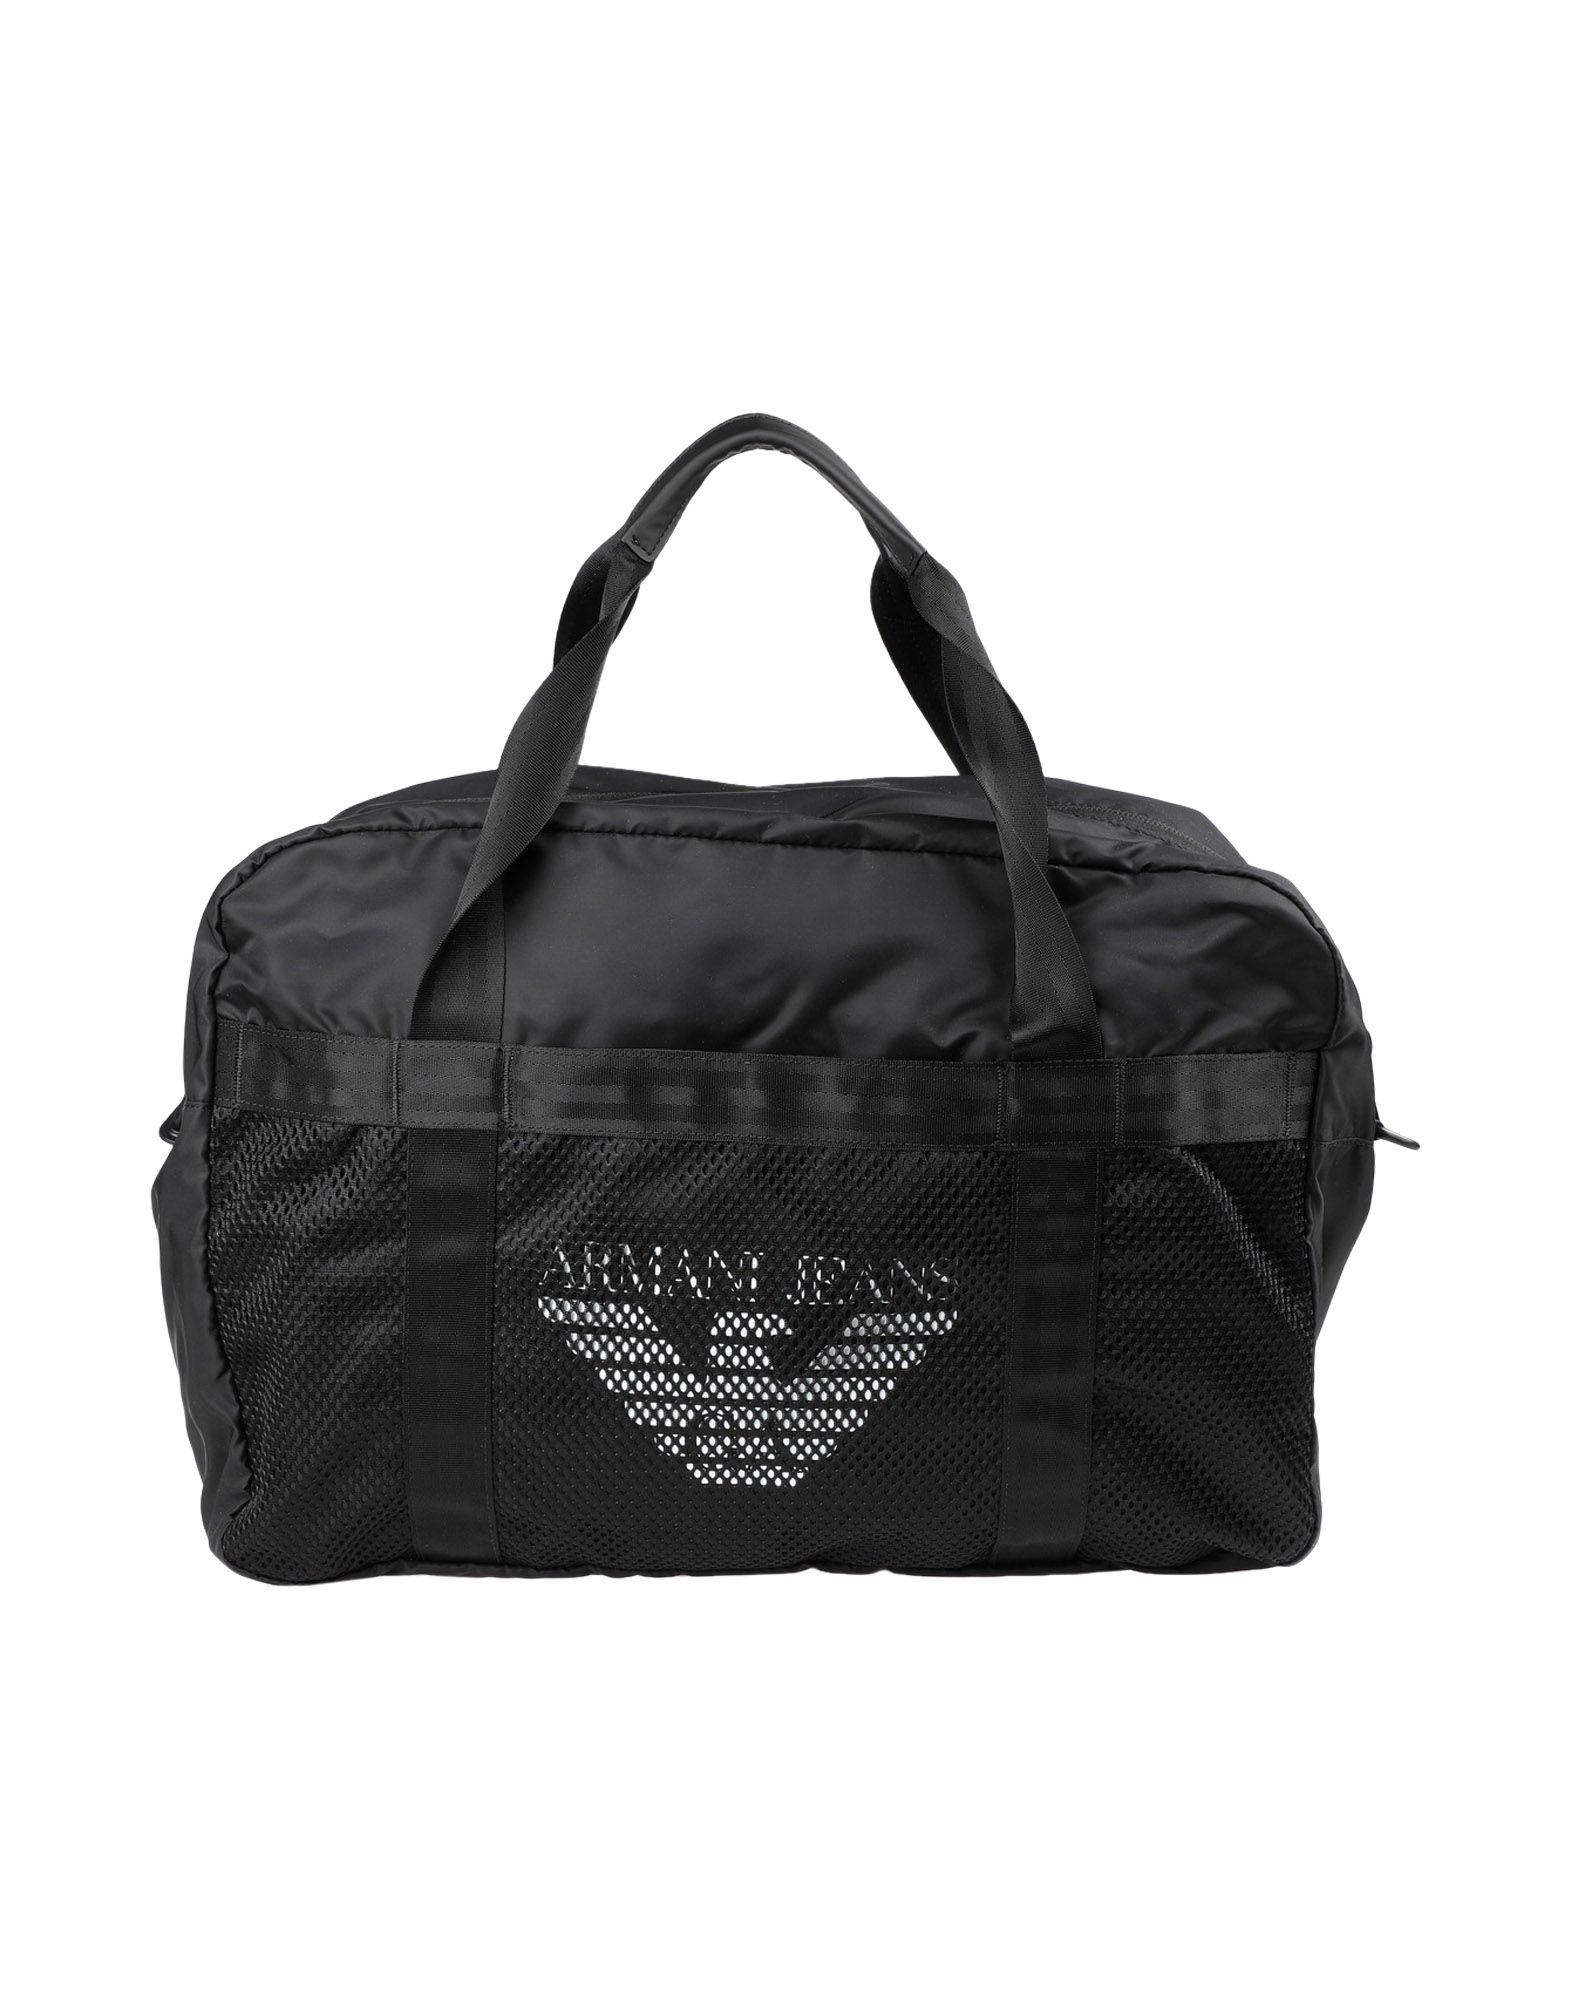 Armani Jeans Travel   Duffel Bag for Men - Armani Jeans Luggage  8ec9b6175ef92